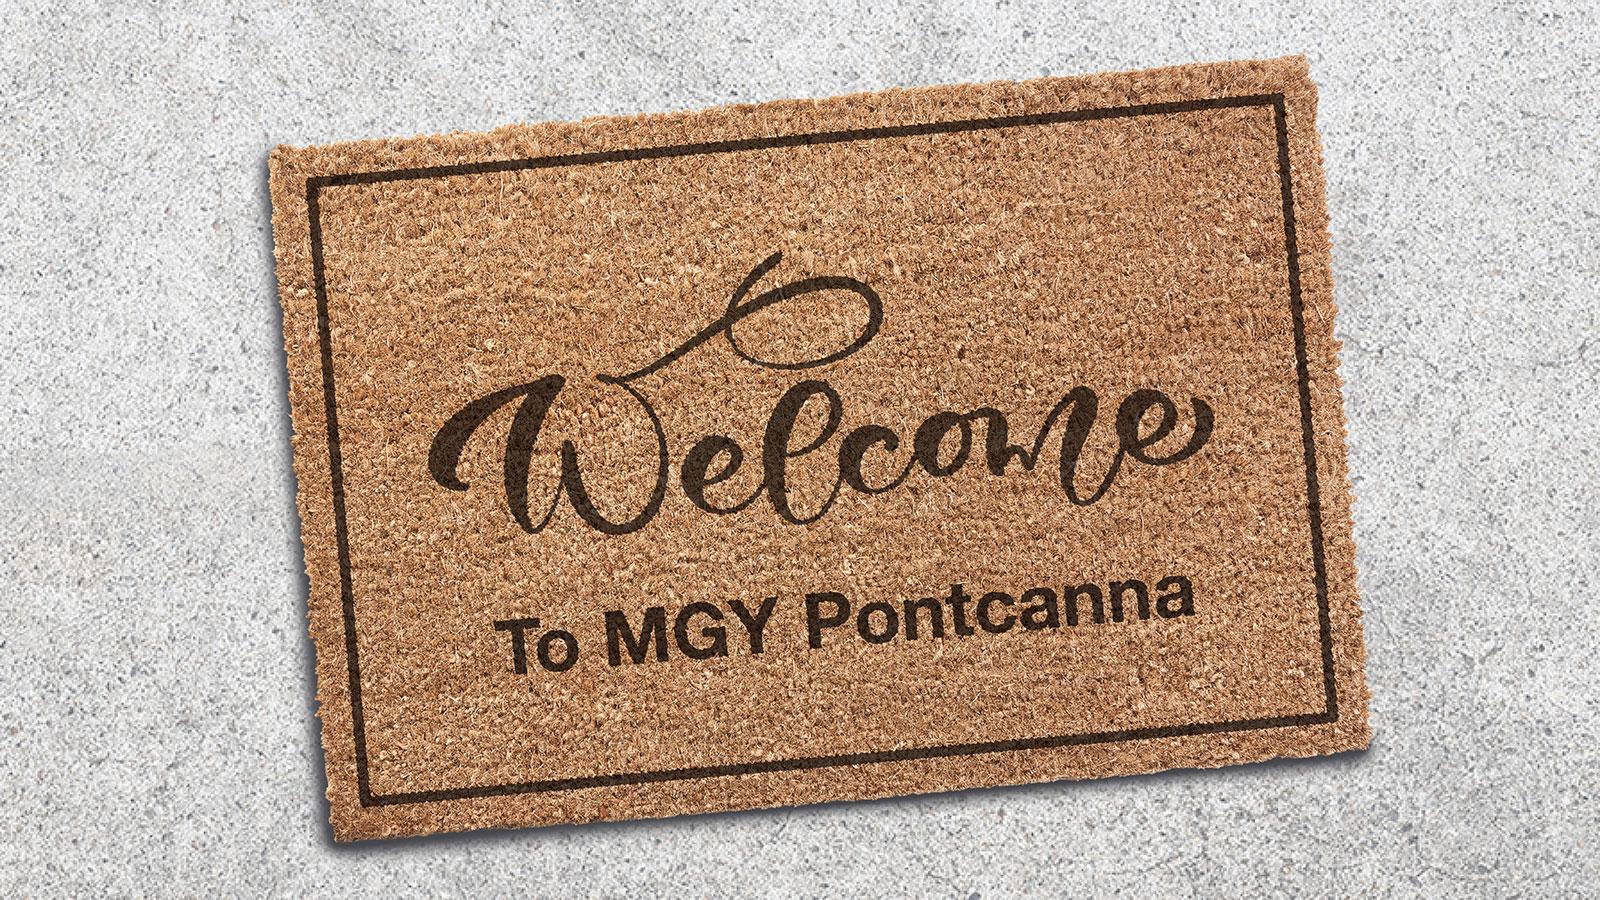 MGY-Pontcanna